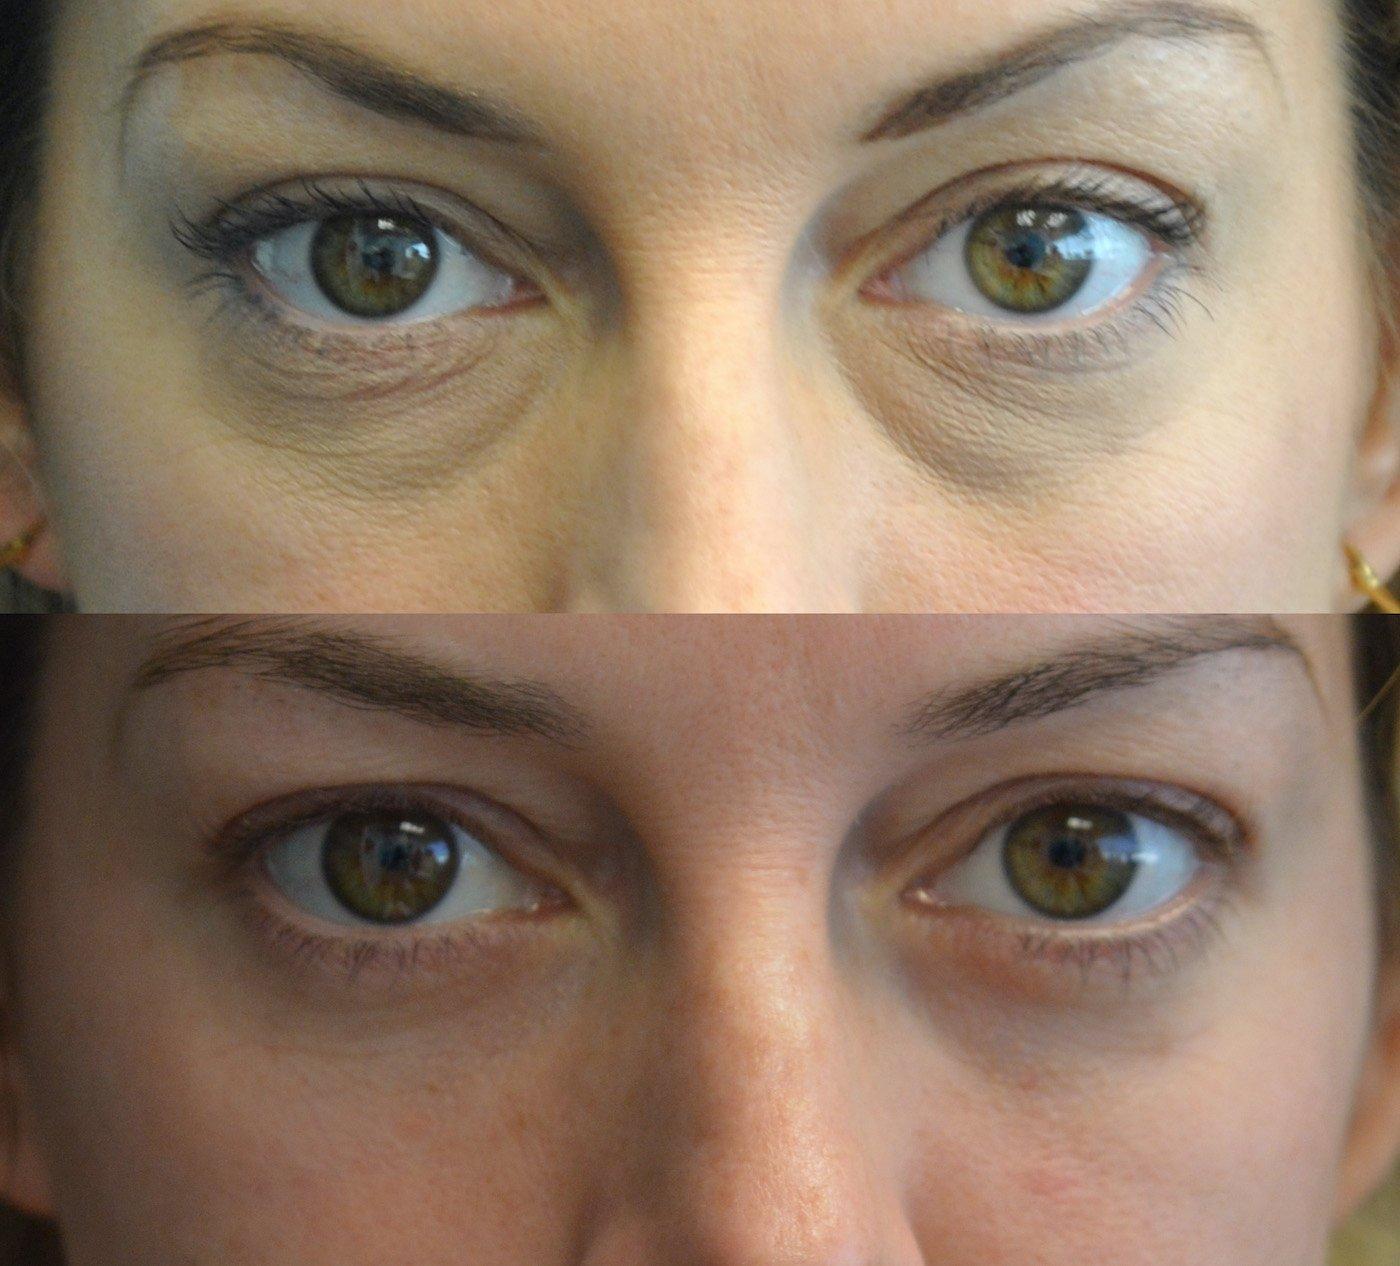 Blepharoplasty lower transconjunctival with peel lower eyelids